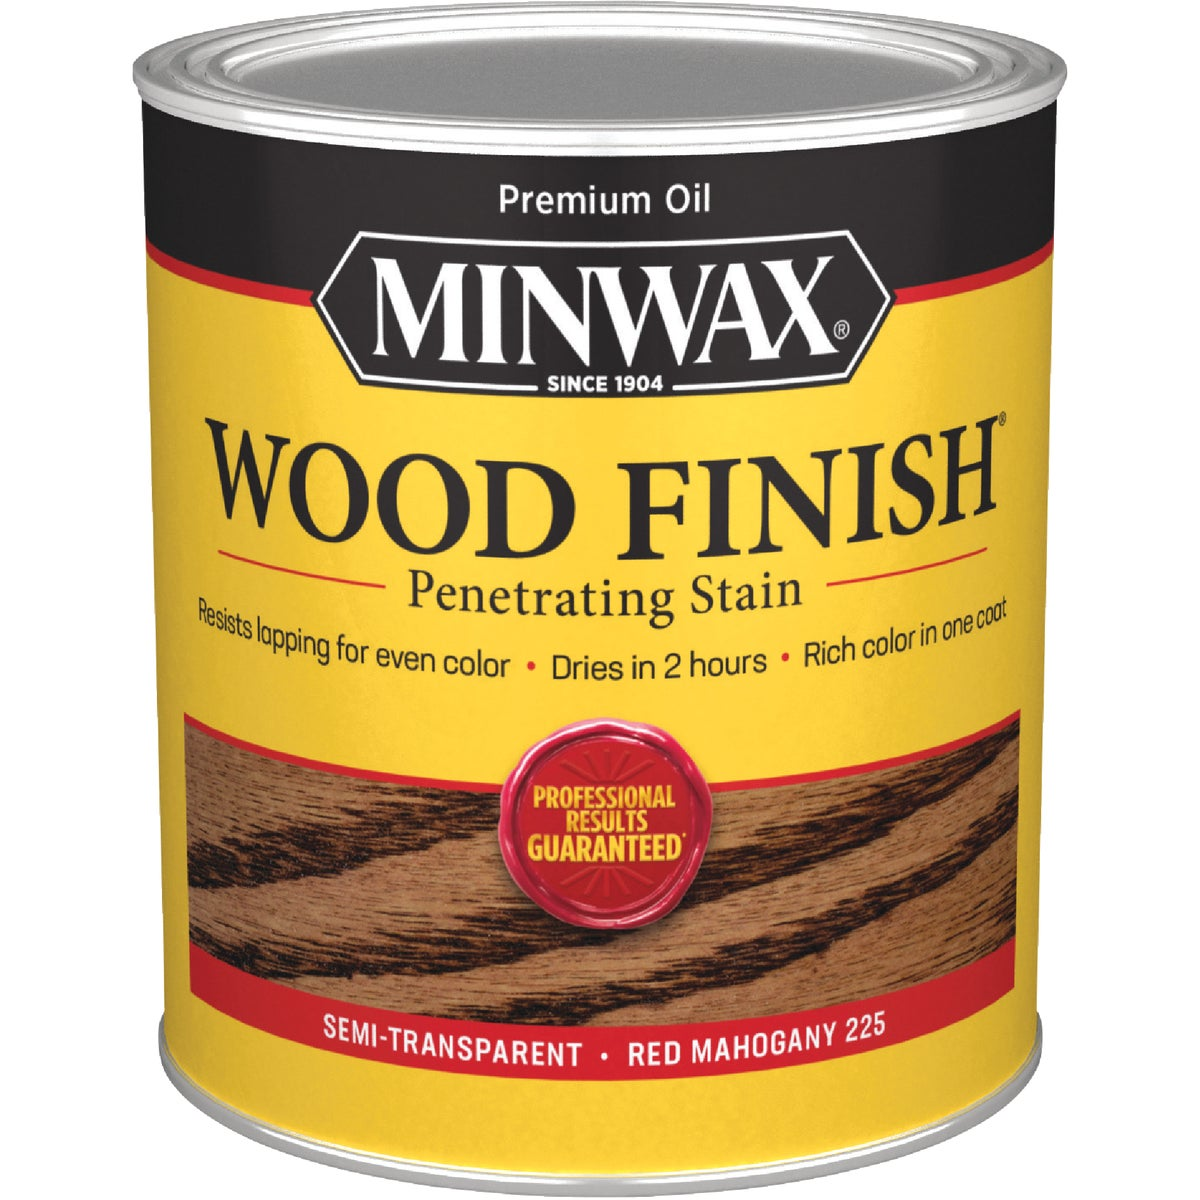 Minwax 70007 1 Quart Wood Finish Interior Wood Stain, Red Mahogany